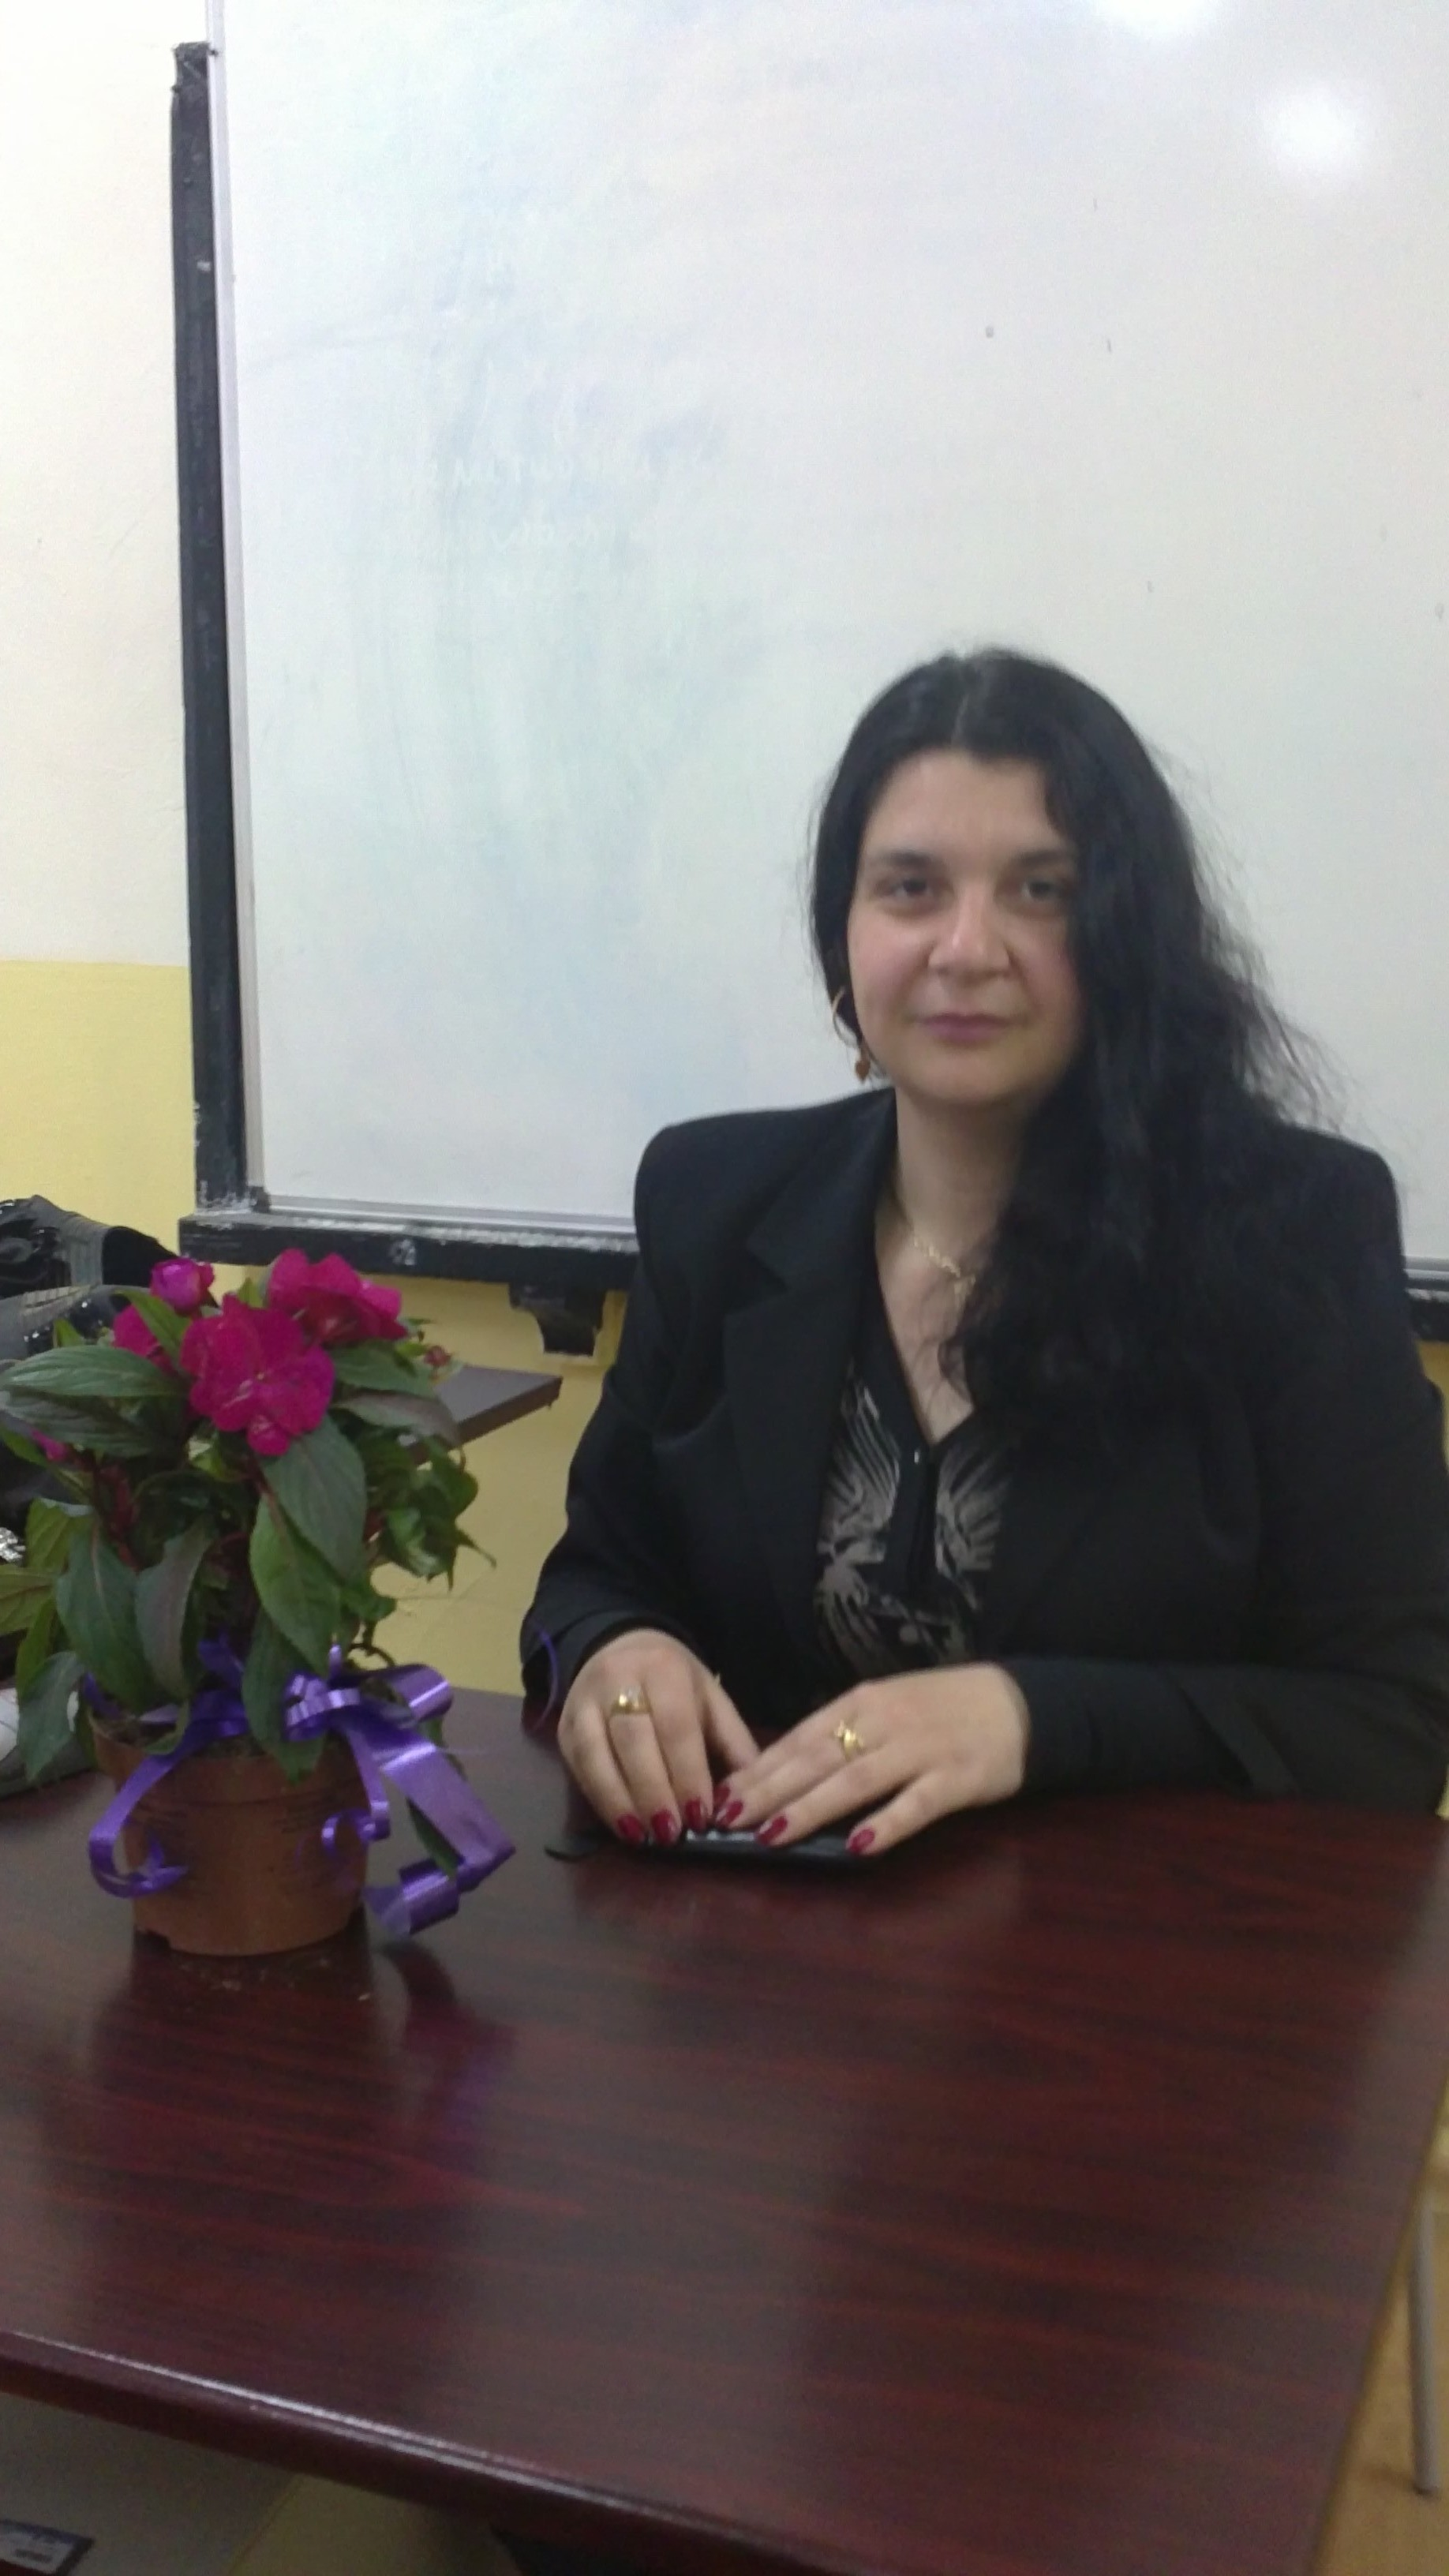 Chorbadjieva